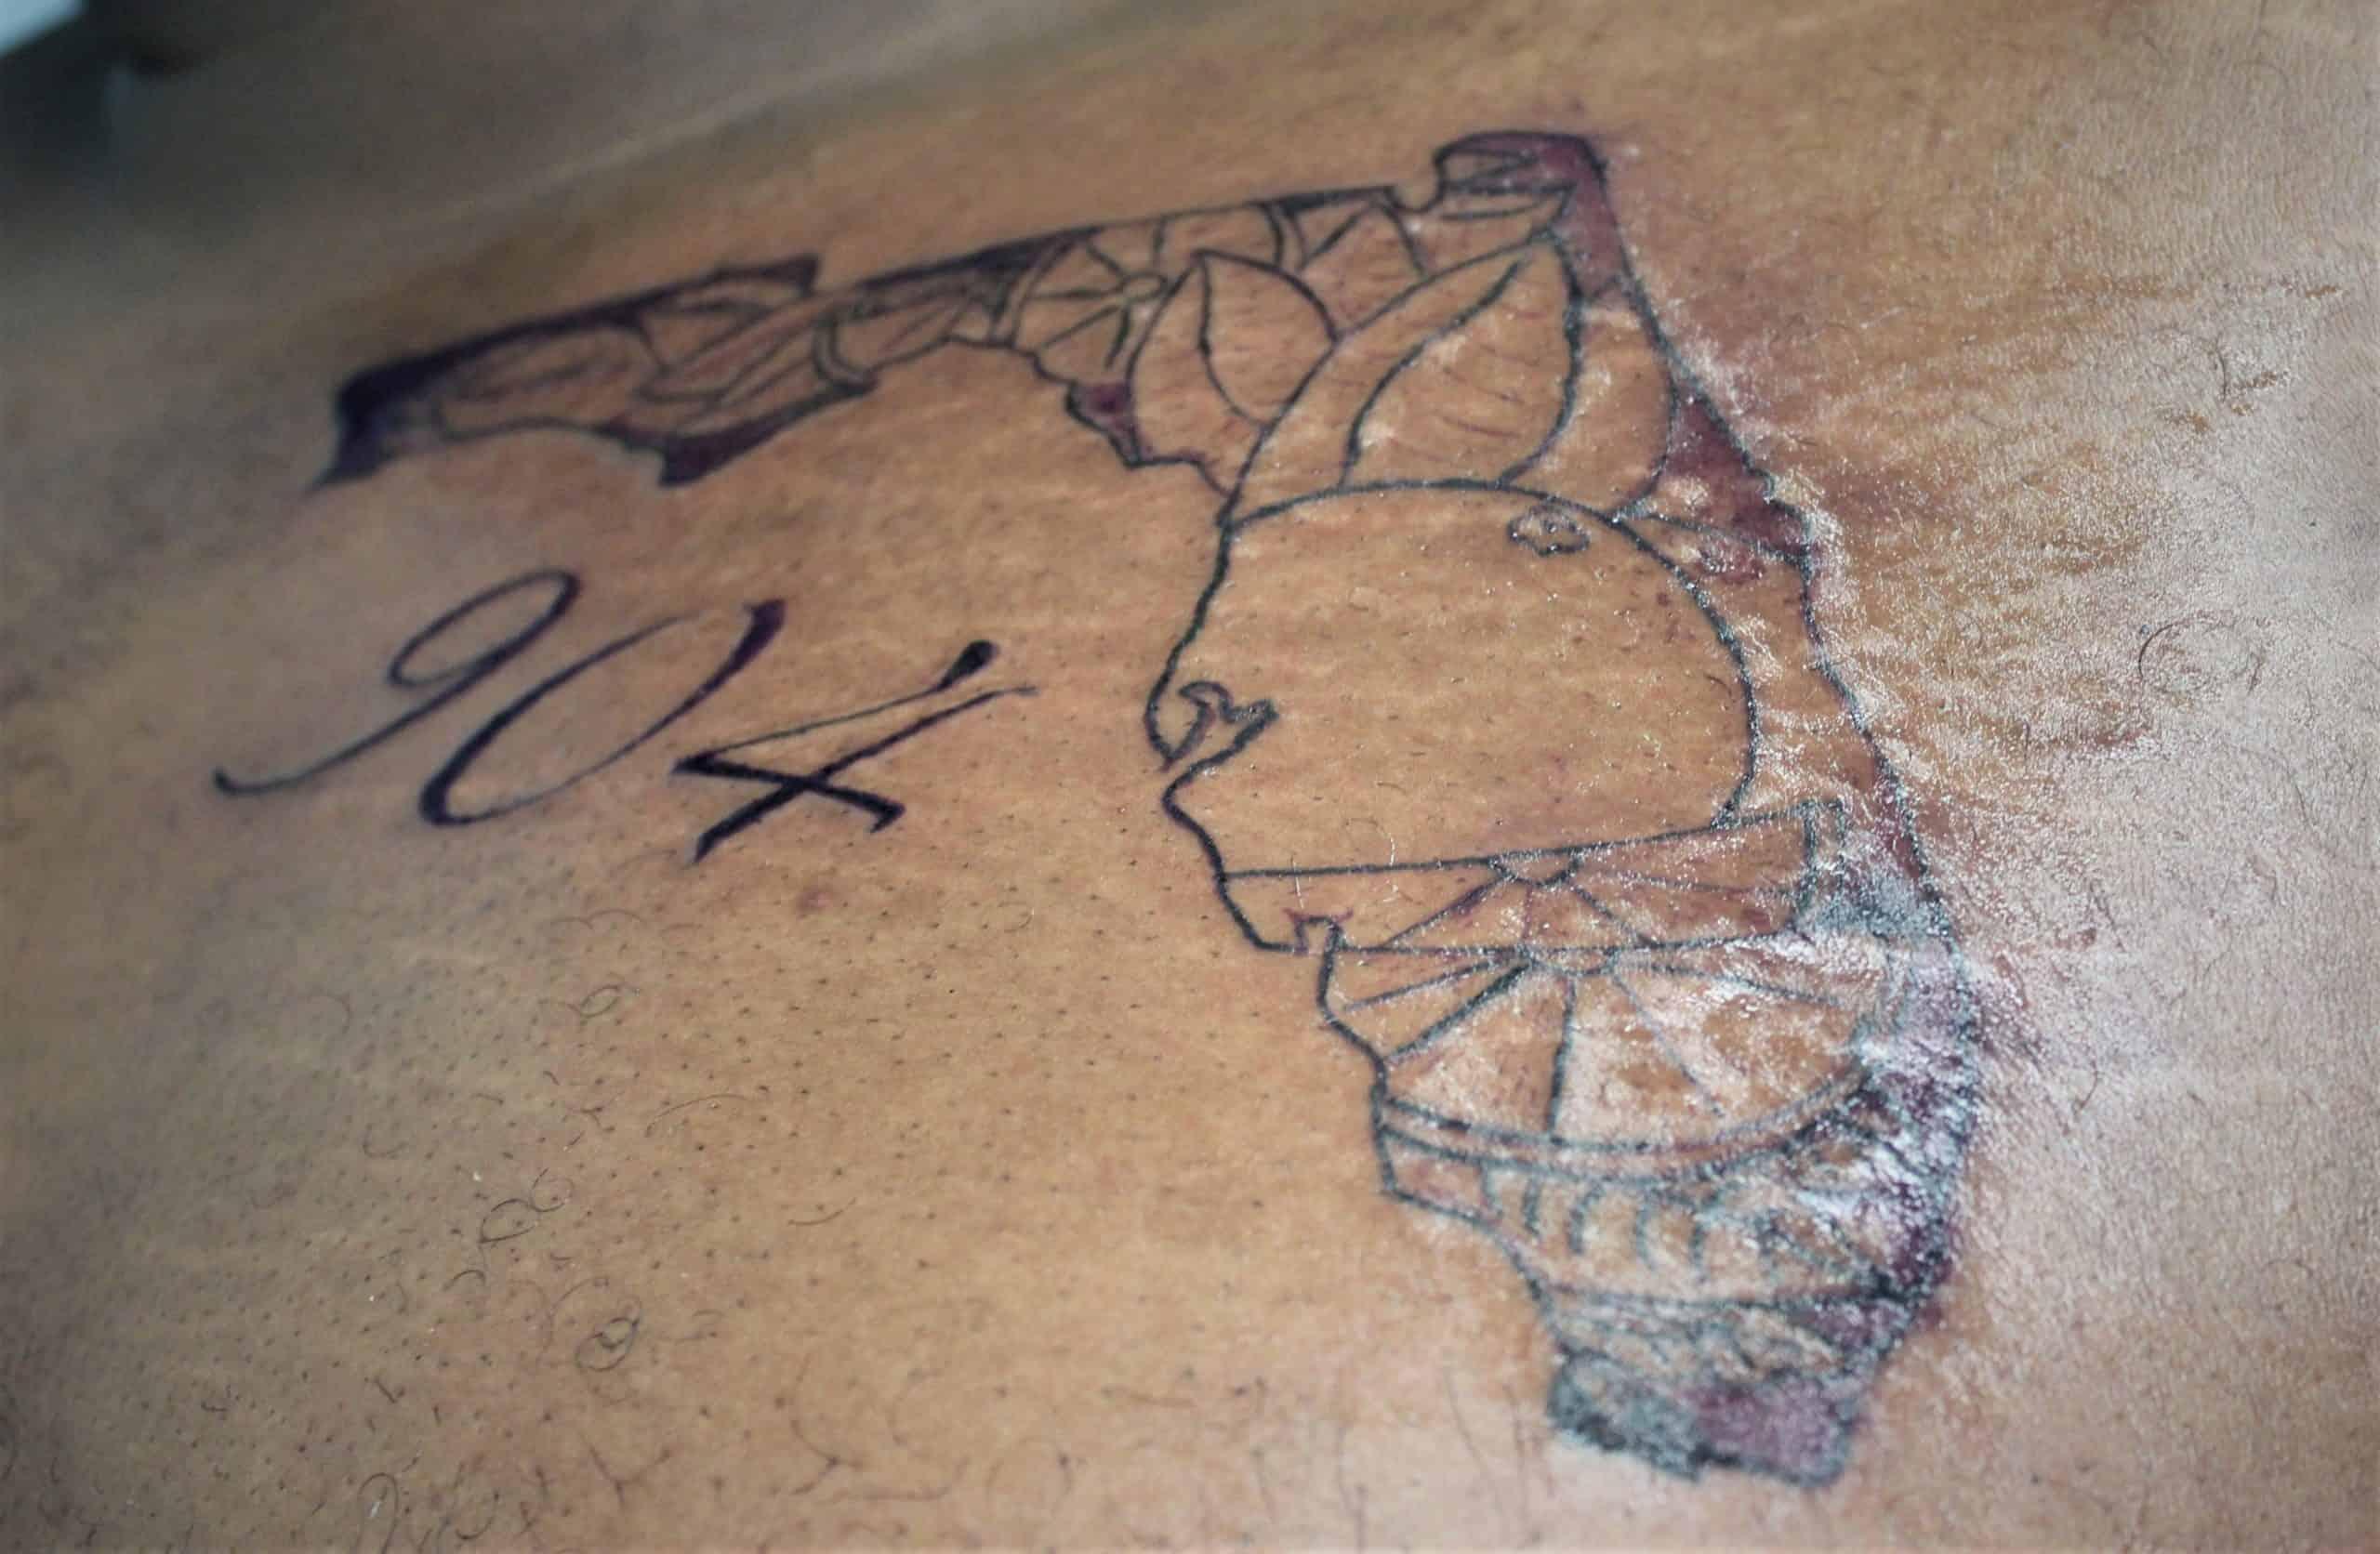 florida 904 tattoo